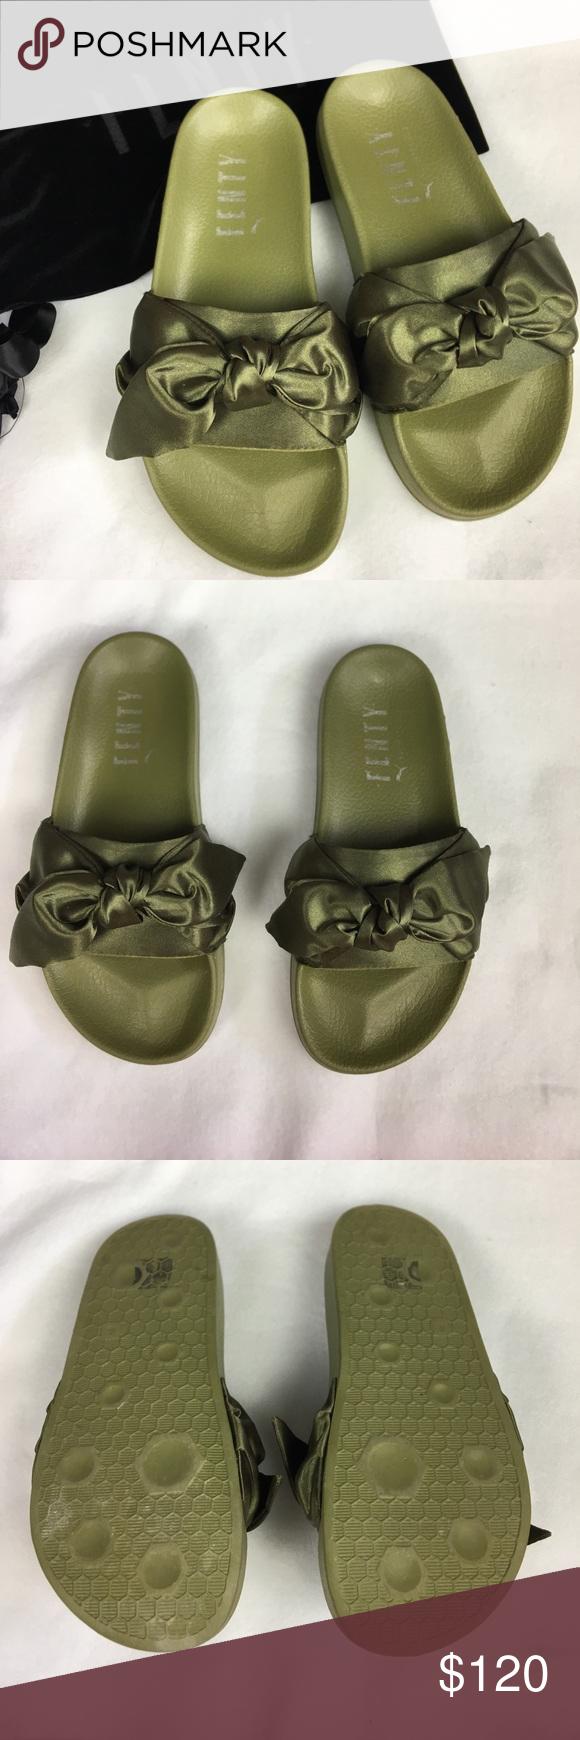 best sneakers 37047 39aea FENTY x PUMA bow slides Authentic Rihanna bow slides ! No ...